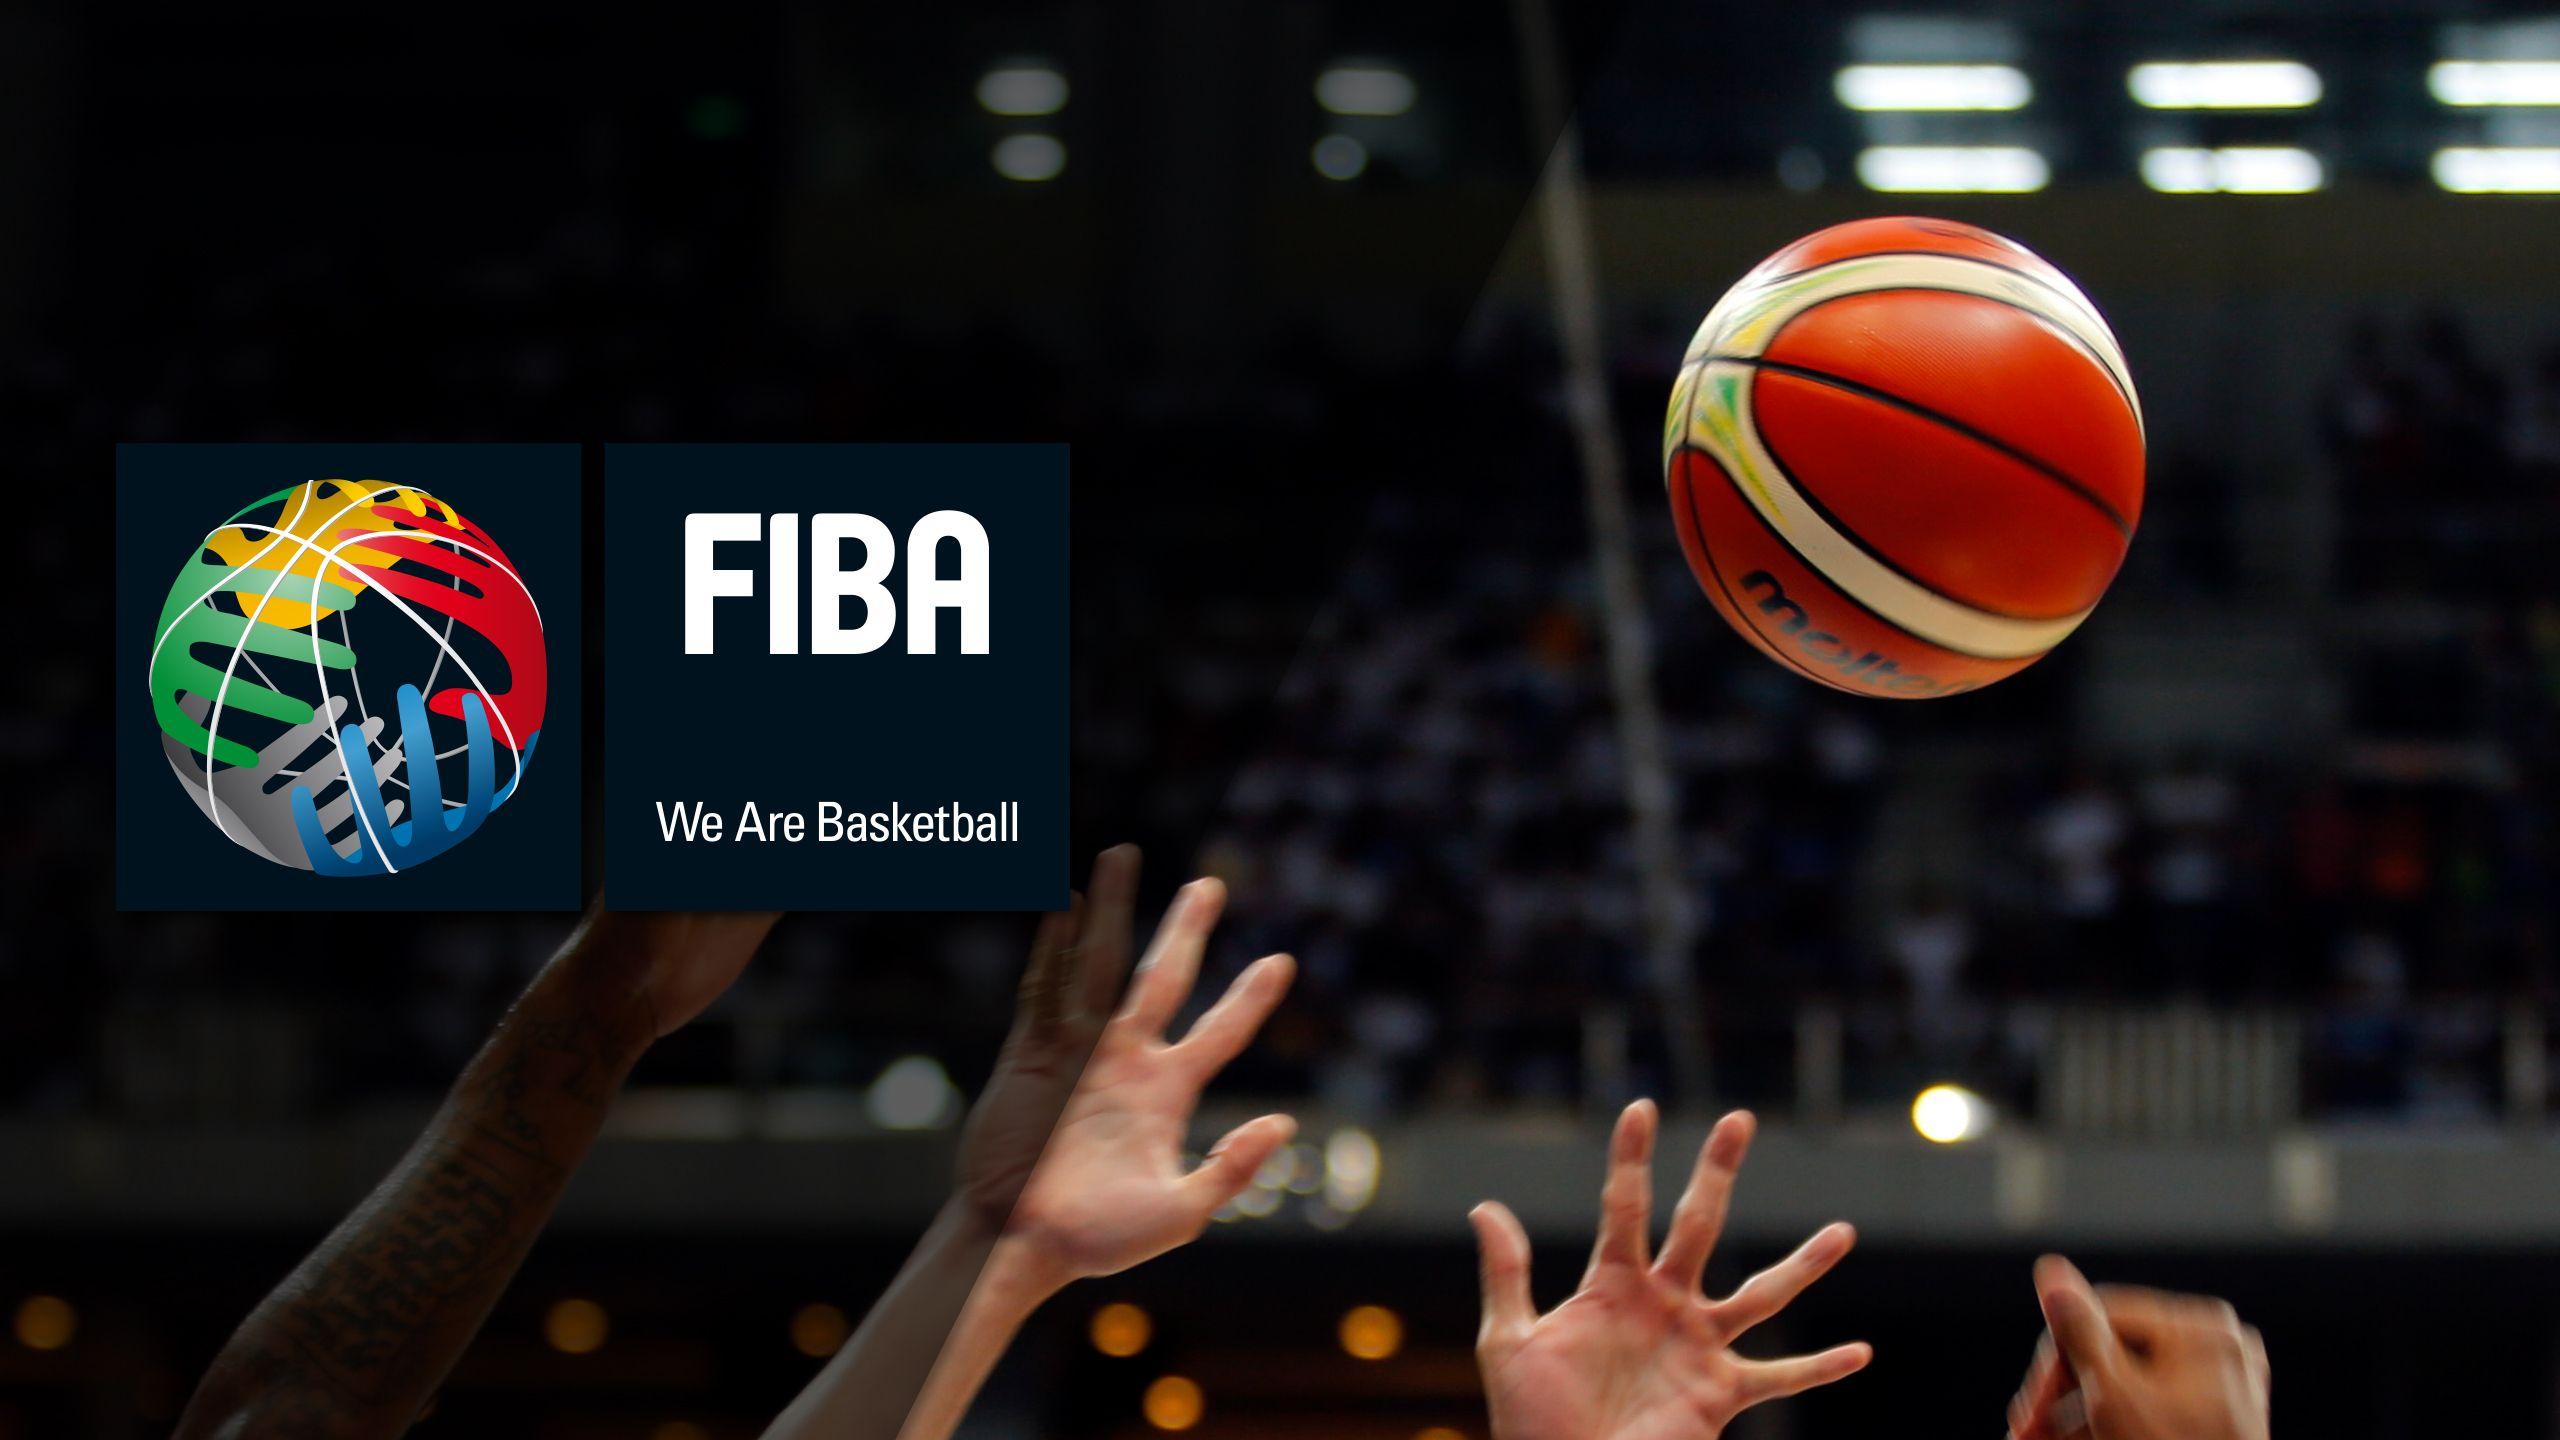 Cuba vs. USA (FIBA World Cup 2019 Qualifier)